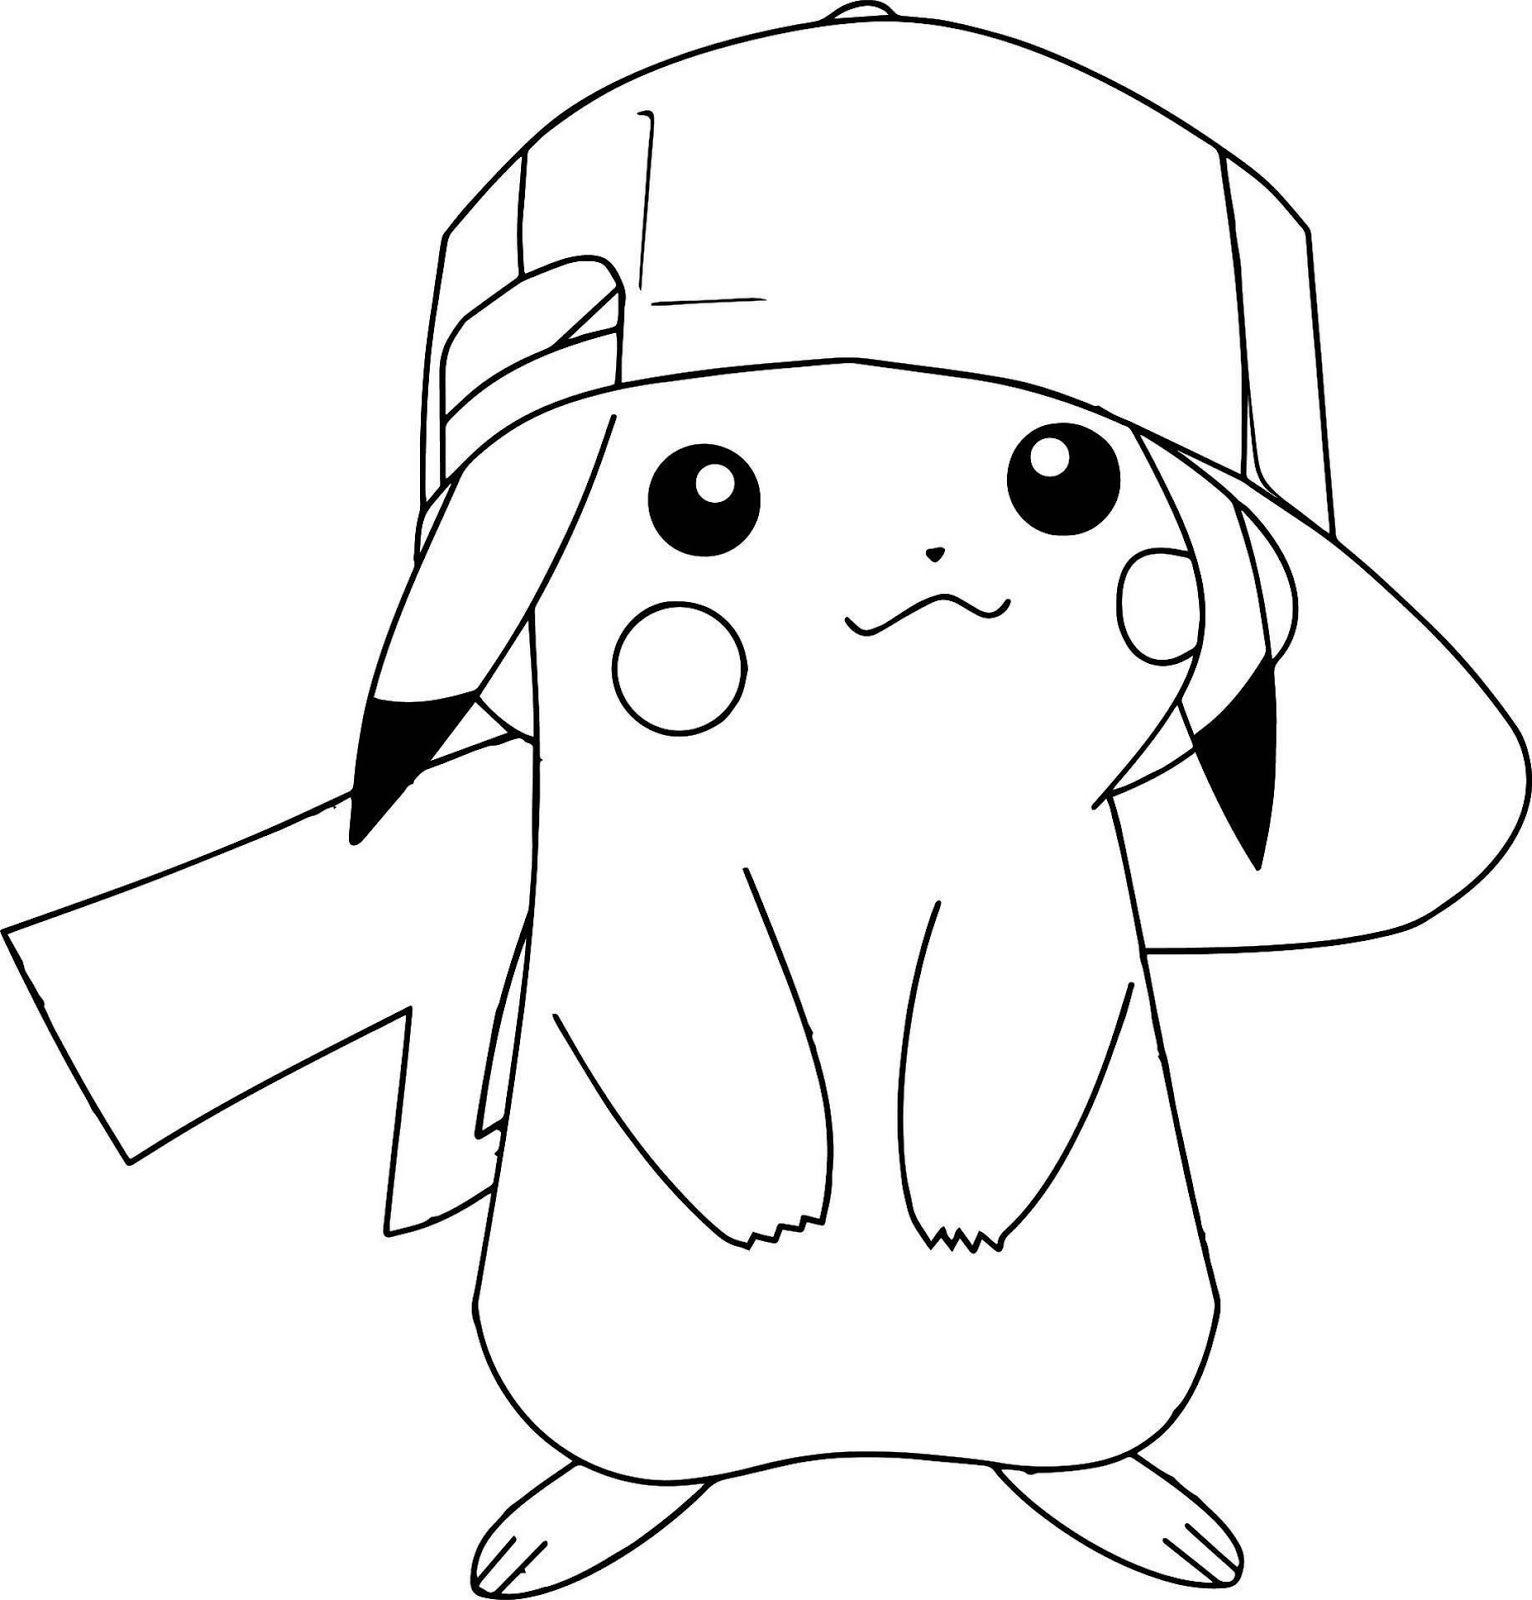 Cute Pokemon Go Pikachu With Ash S Hat Coloring Pages In 2020 Pikachu Coloring Page Cartoon Coloring Pages Pokemon Coloring Pages